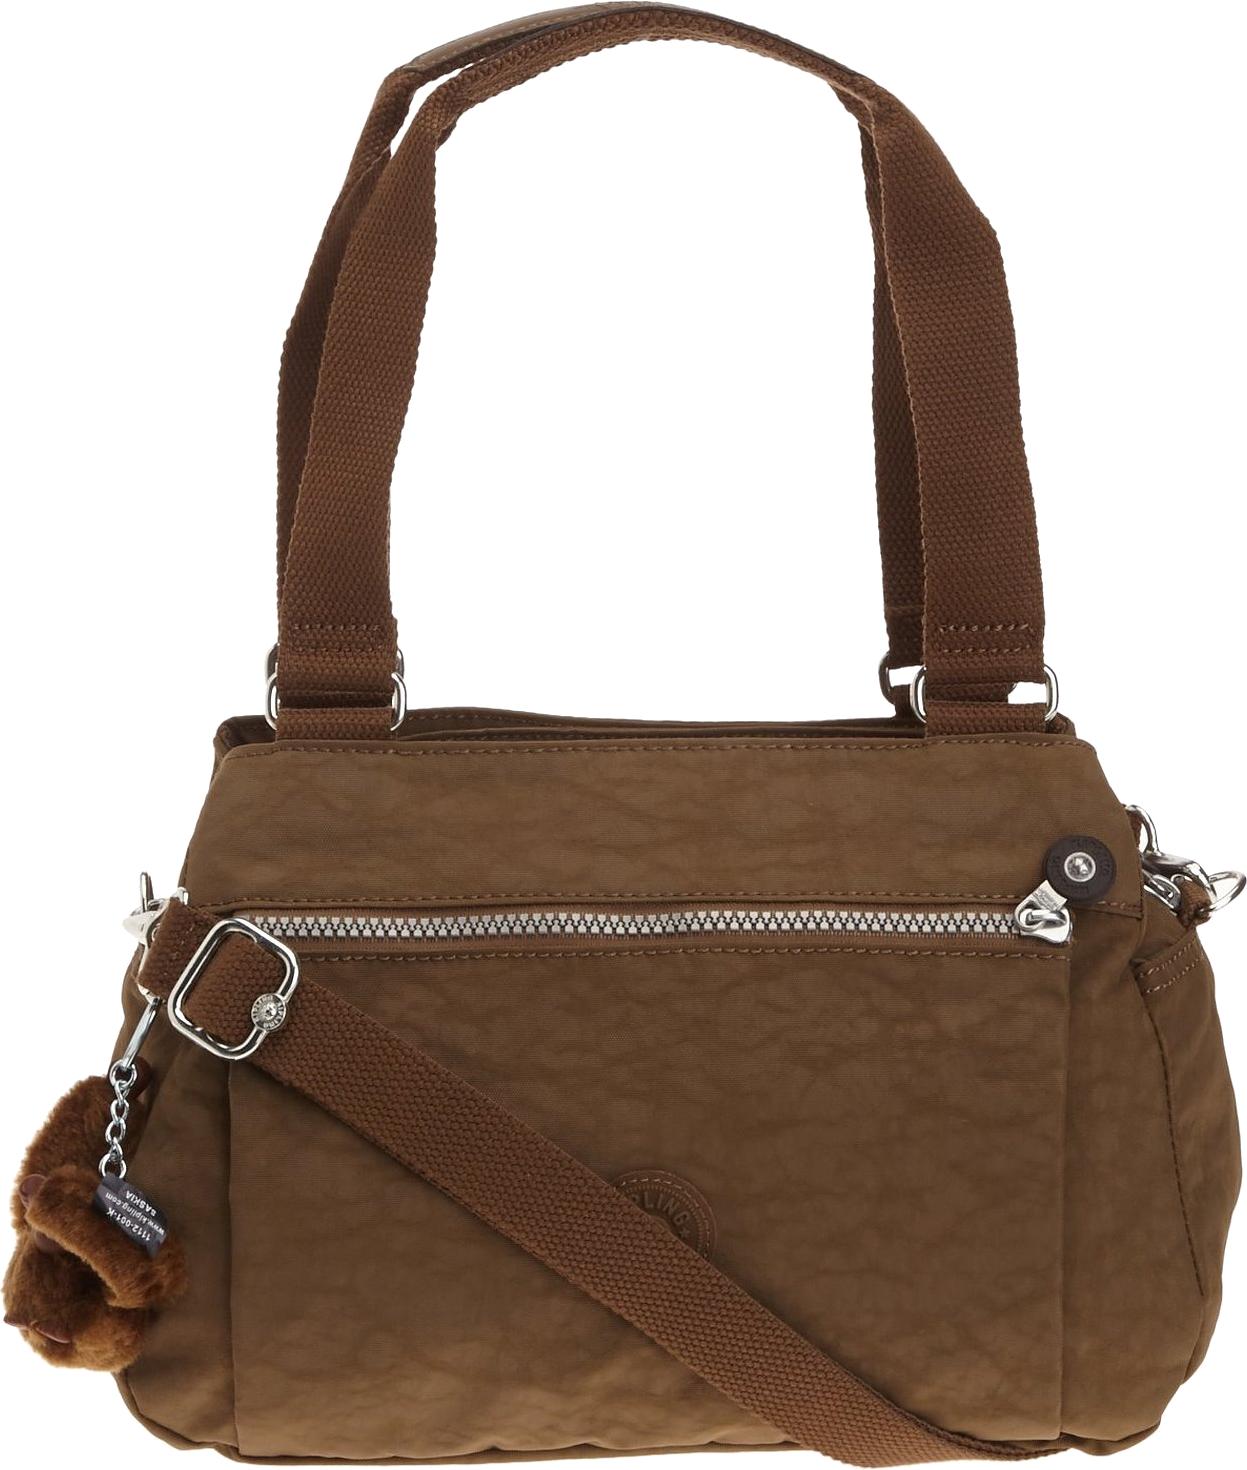 Women Bag PNG Image